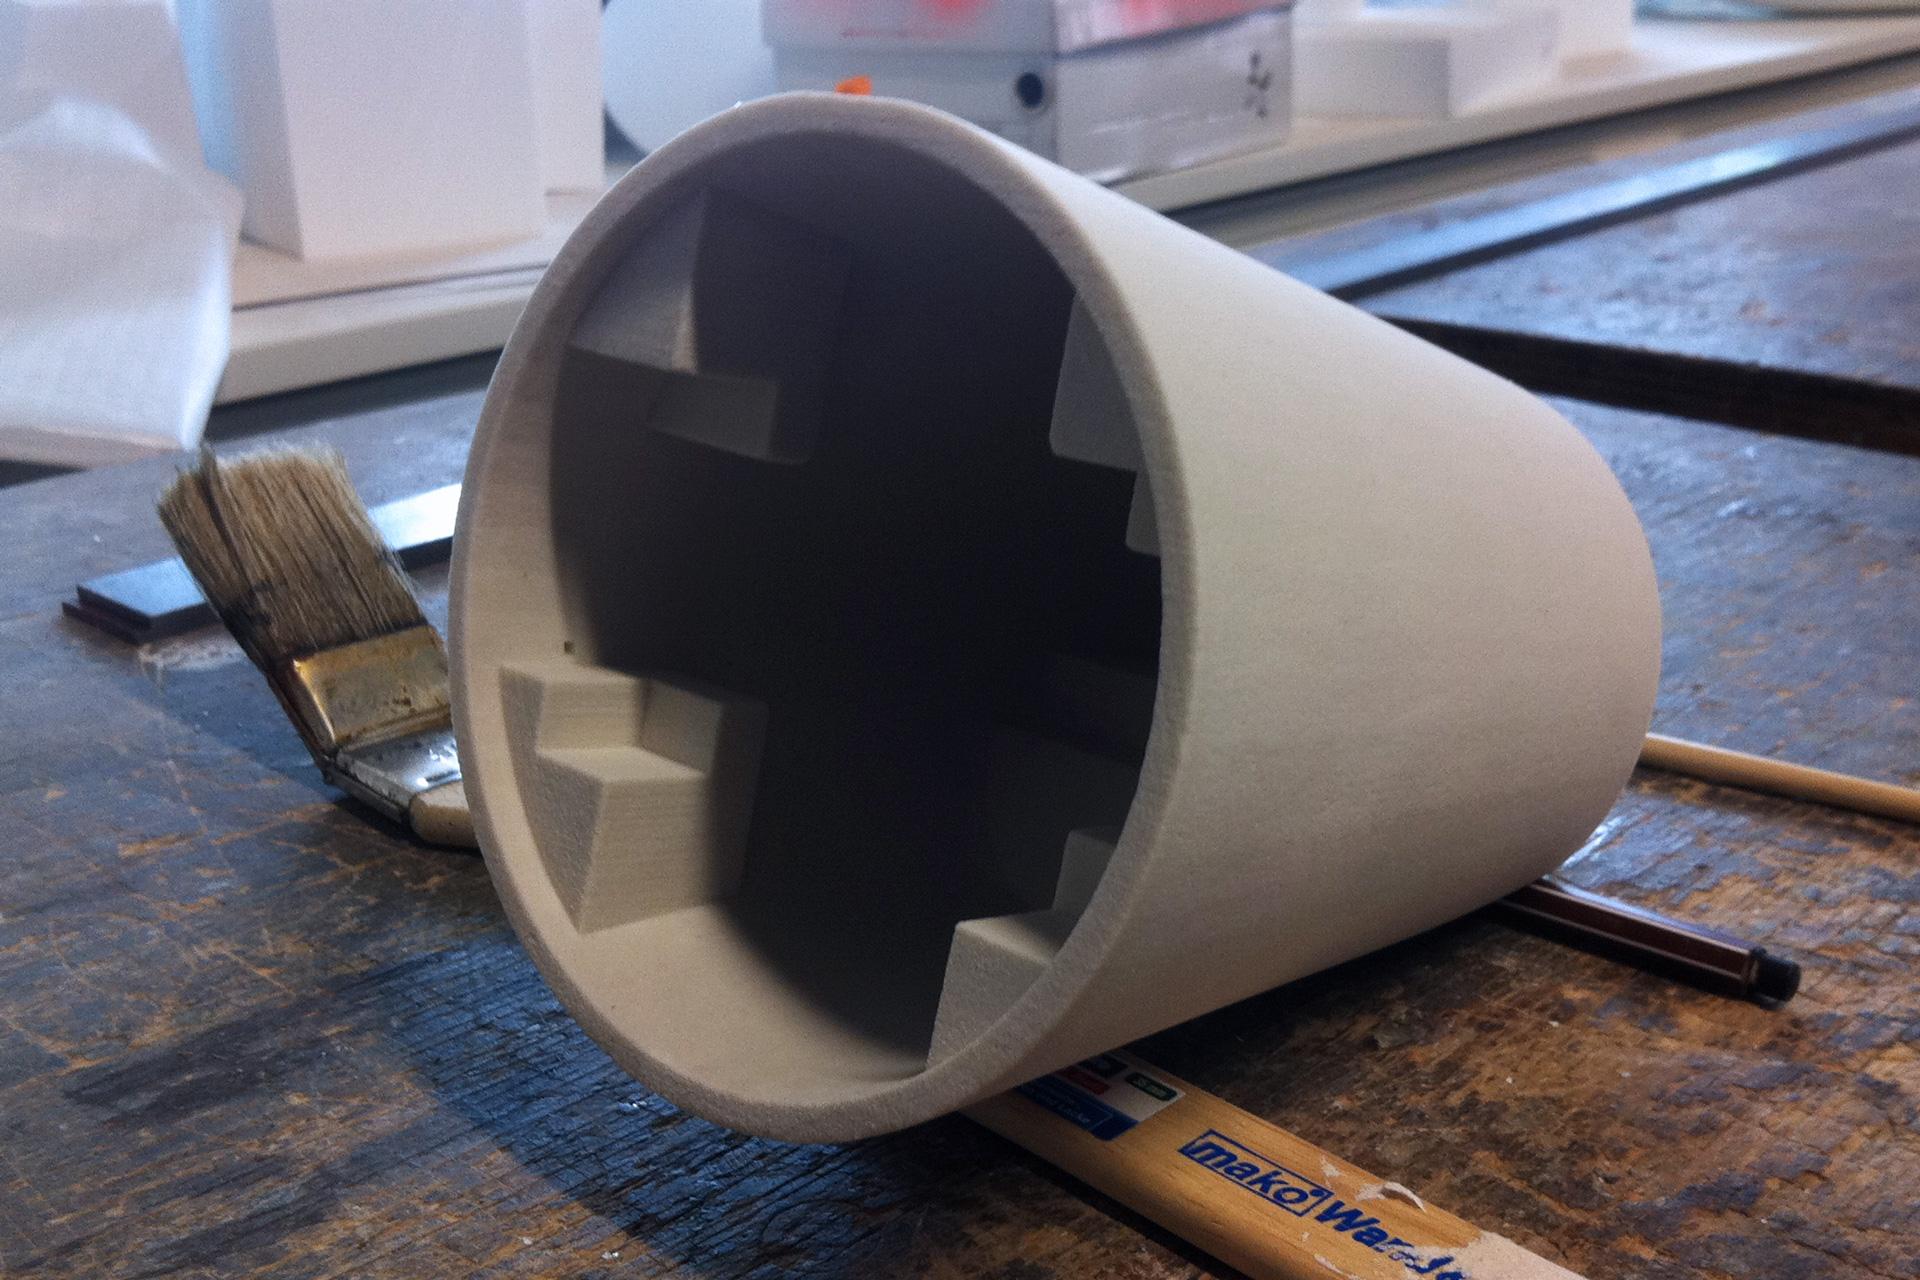 Gips-ähnliches Hülle des Prototypen trocknet gerade